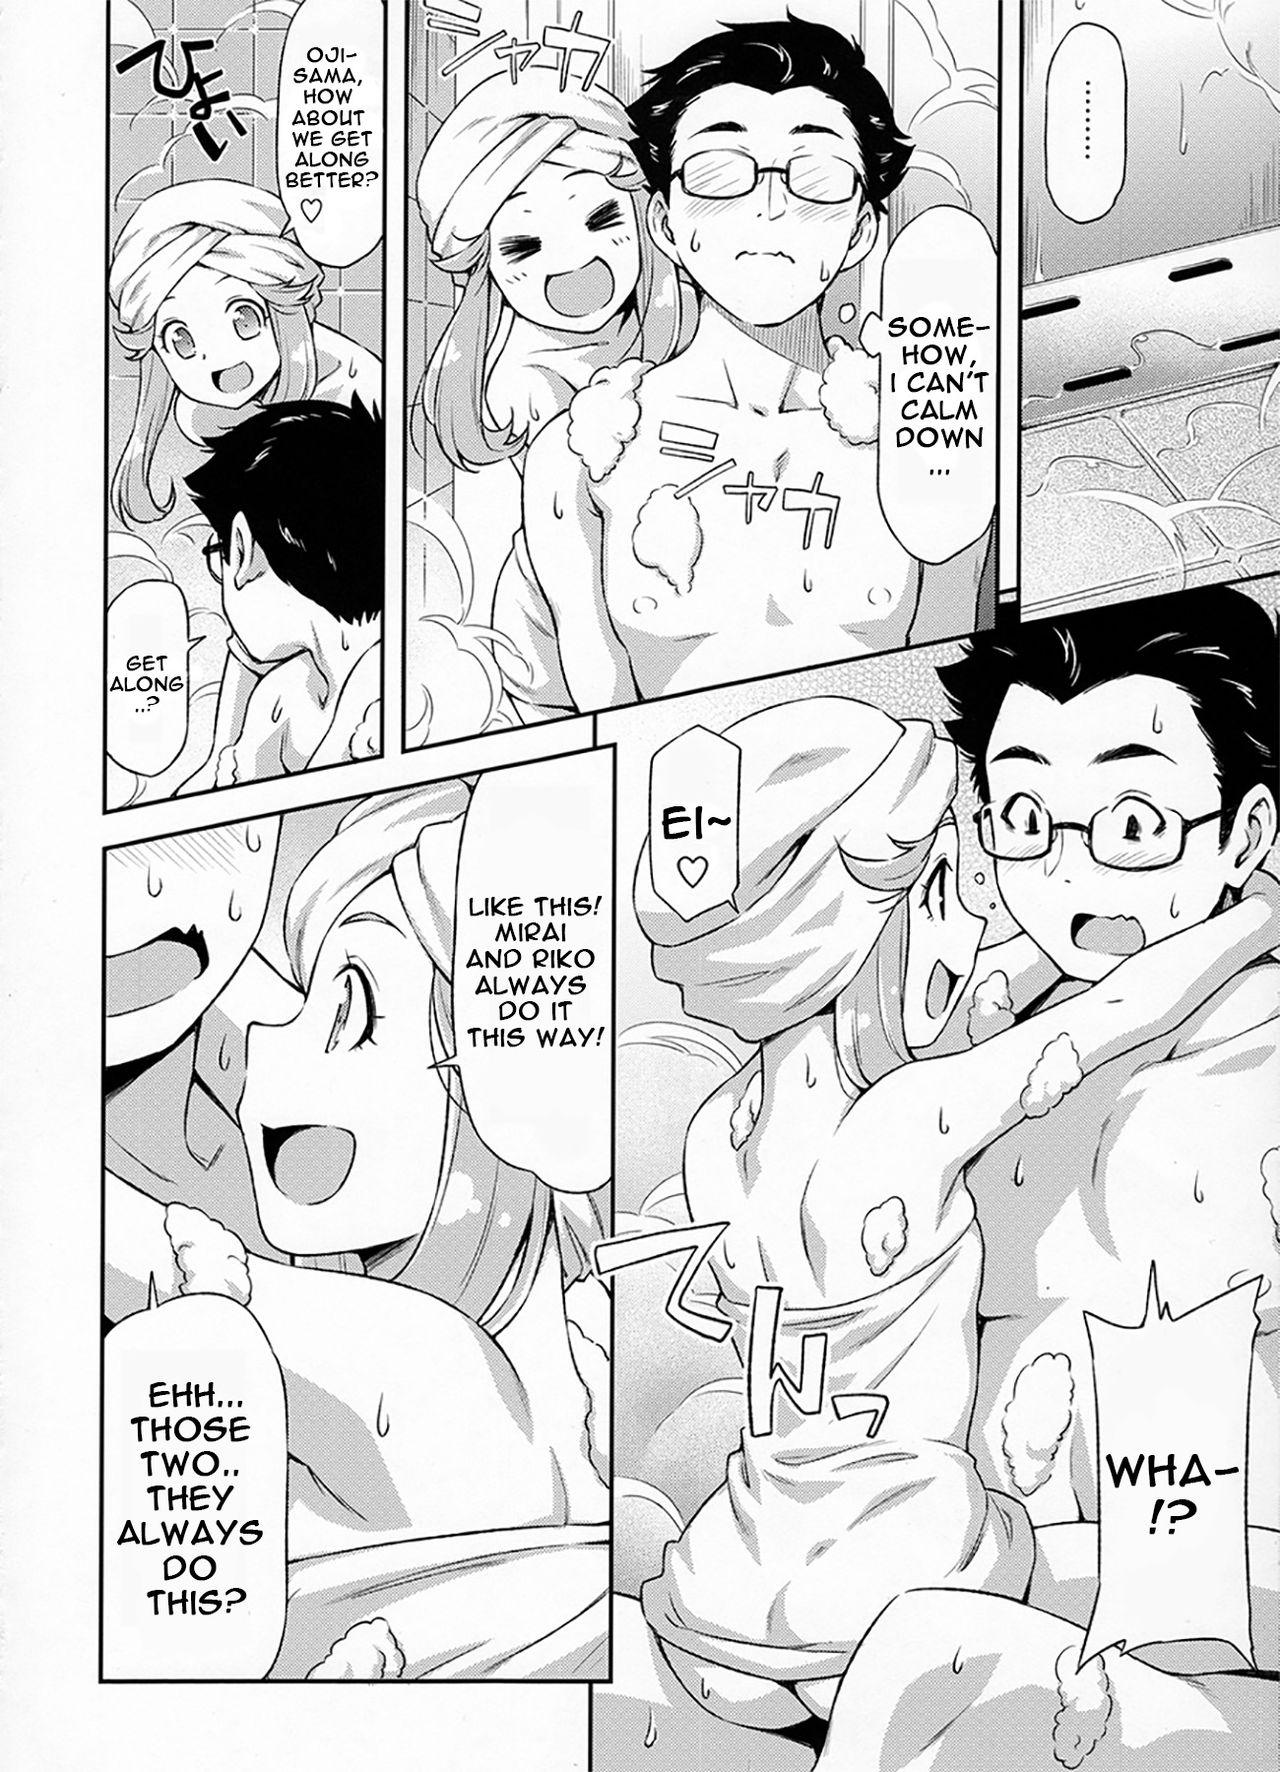 (C91) [ACID EATERS (Kazuma Muramasa)] Haa-chan to Furo ni Haireba.   Taking a Bath With Ha-chan. (Mahou Tsukai Precure!) [English] [nisashi13 + MaxChronos] 6